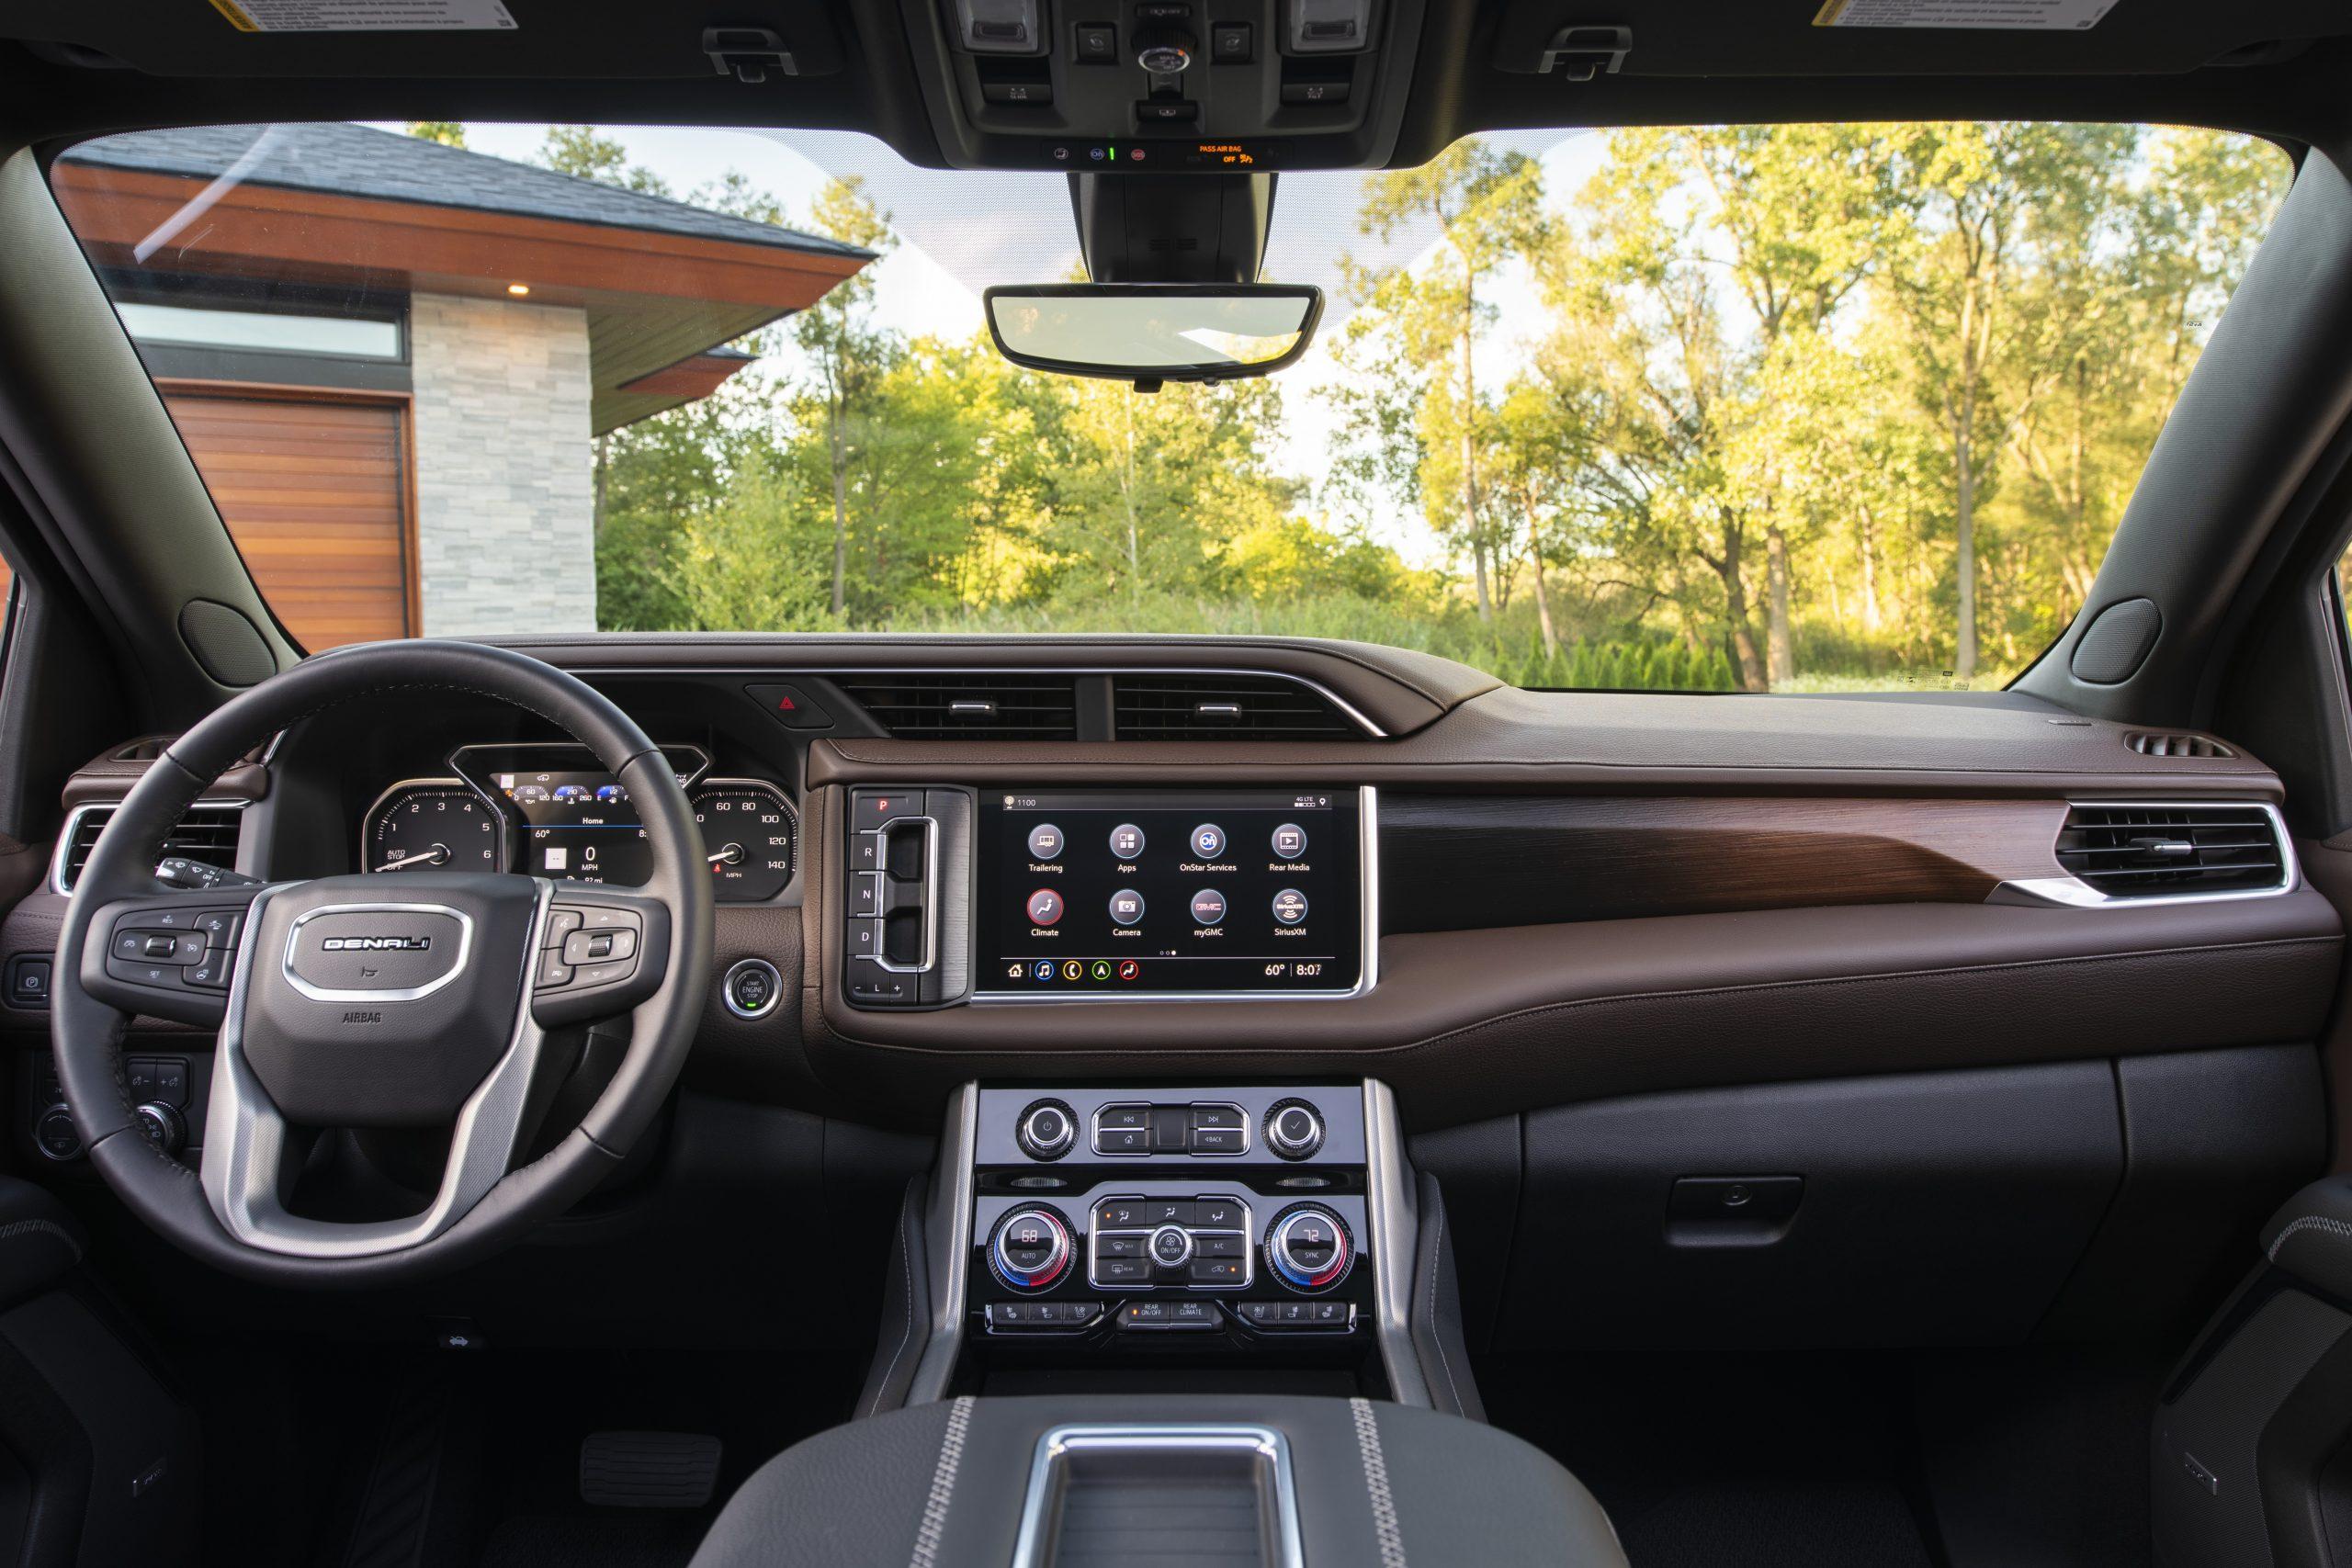 2021 GMC Yukon Denali centered interior shot